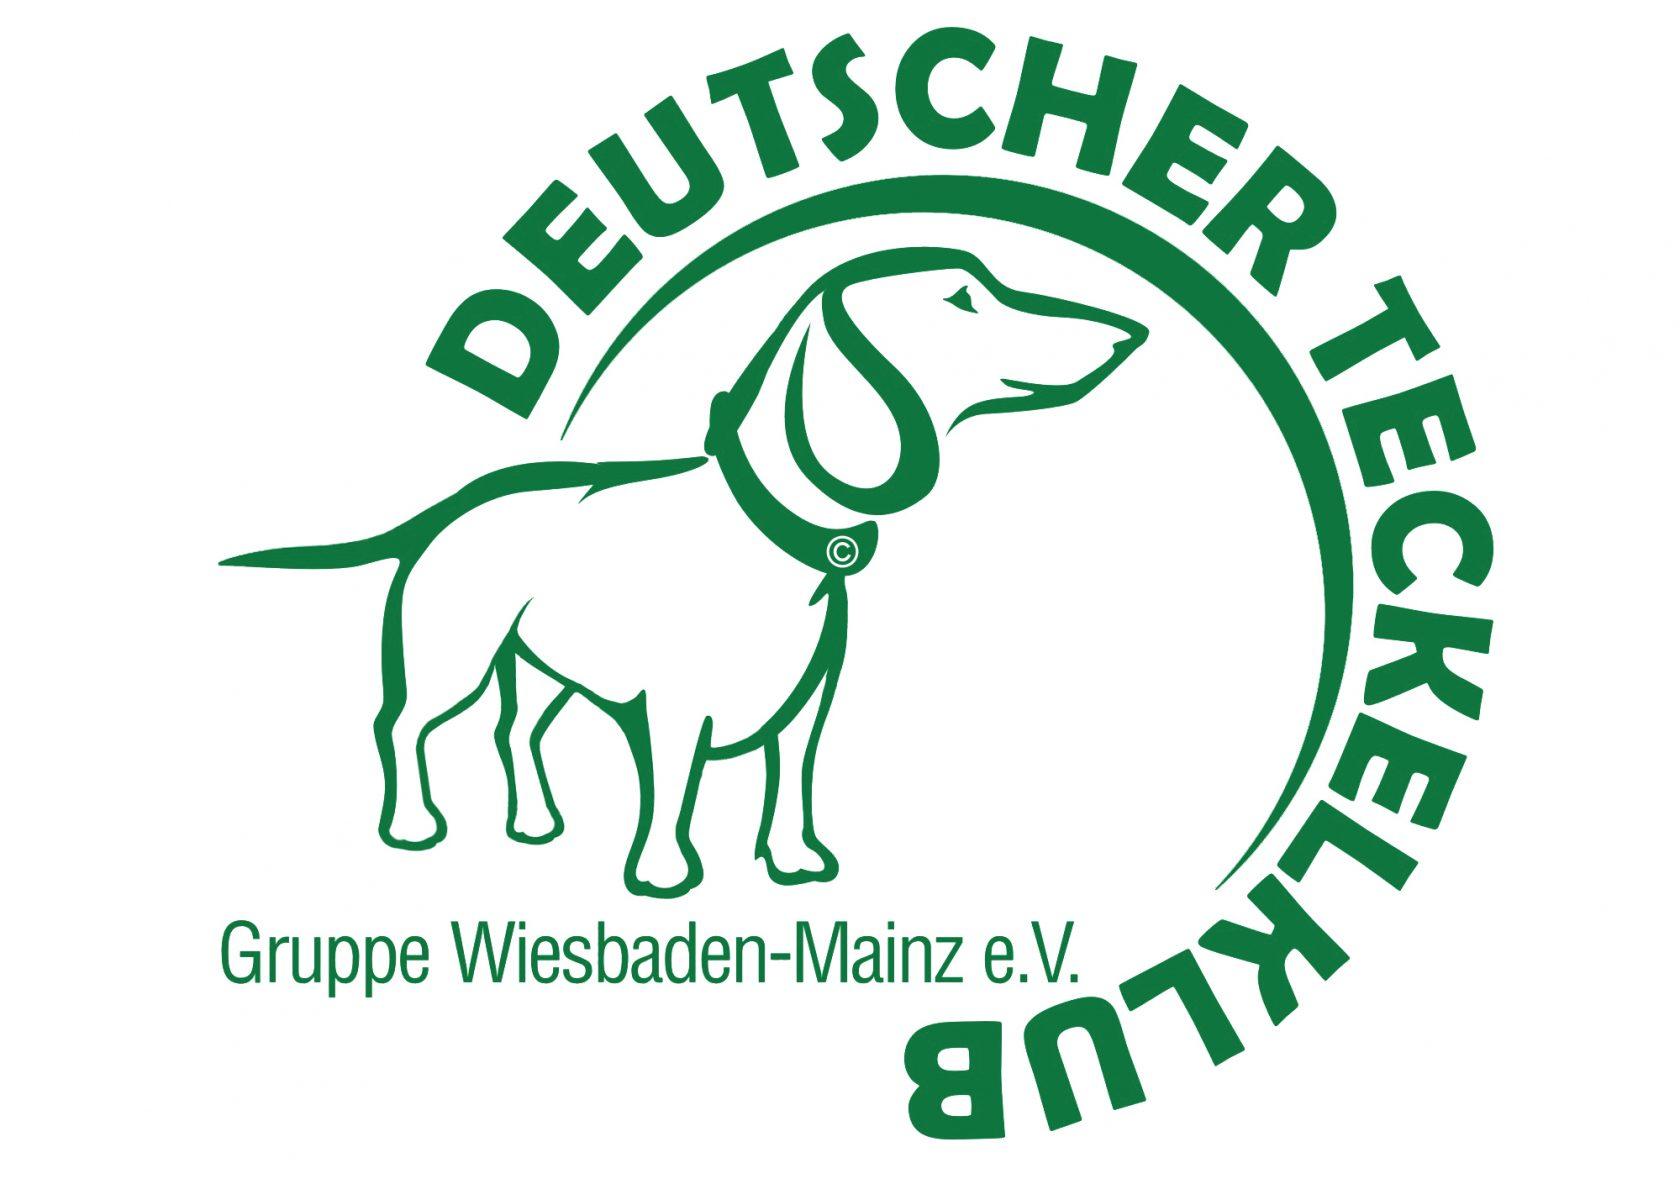 http://teckelklub-wiesbaden-mainz.de/wp-content/uploads/2018/01/cropped-Logo-WI-MZ-C-Endprodukt-1.jpg